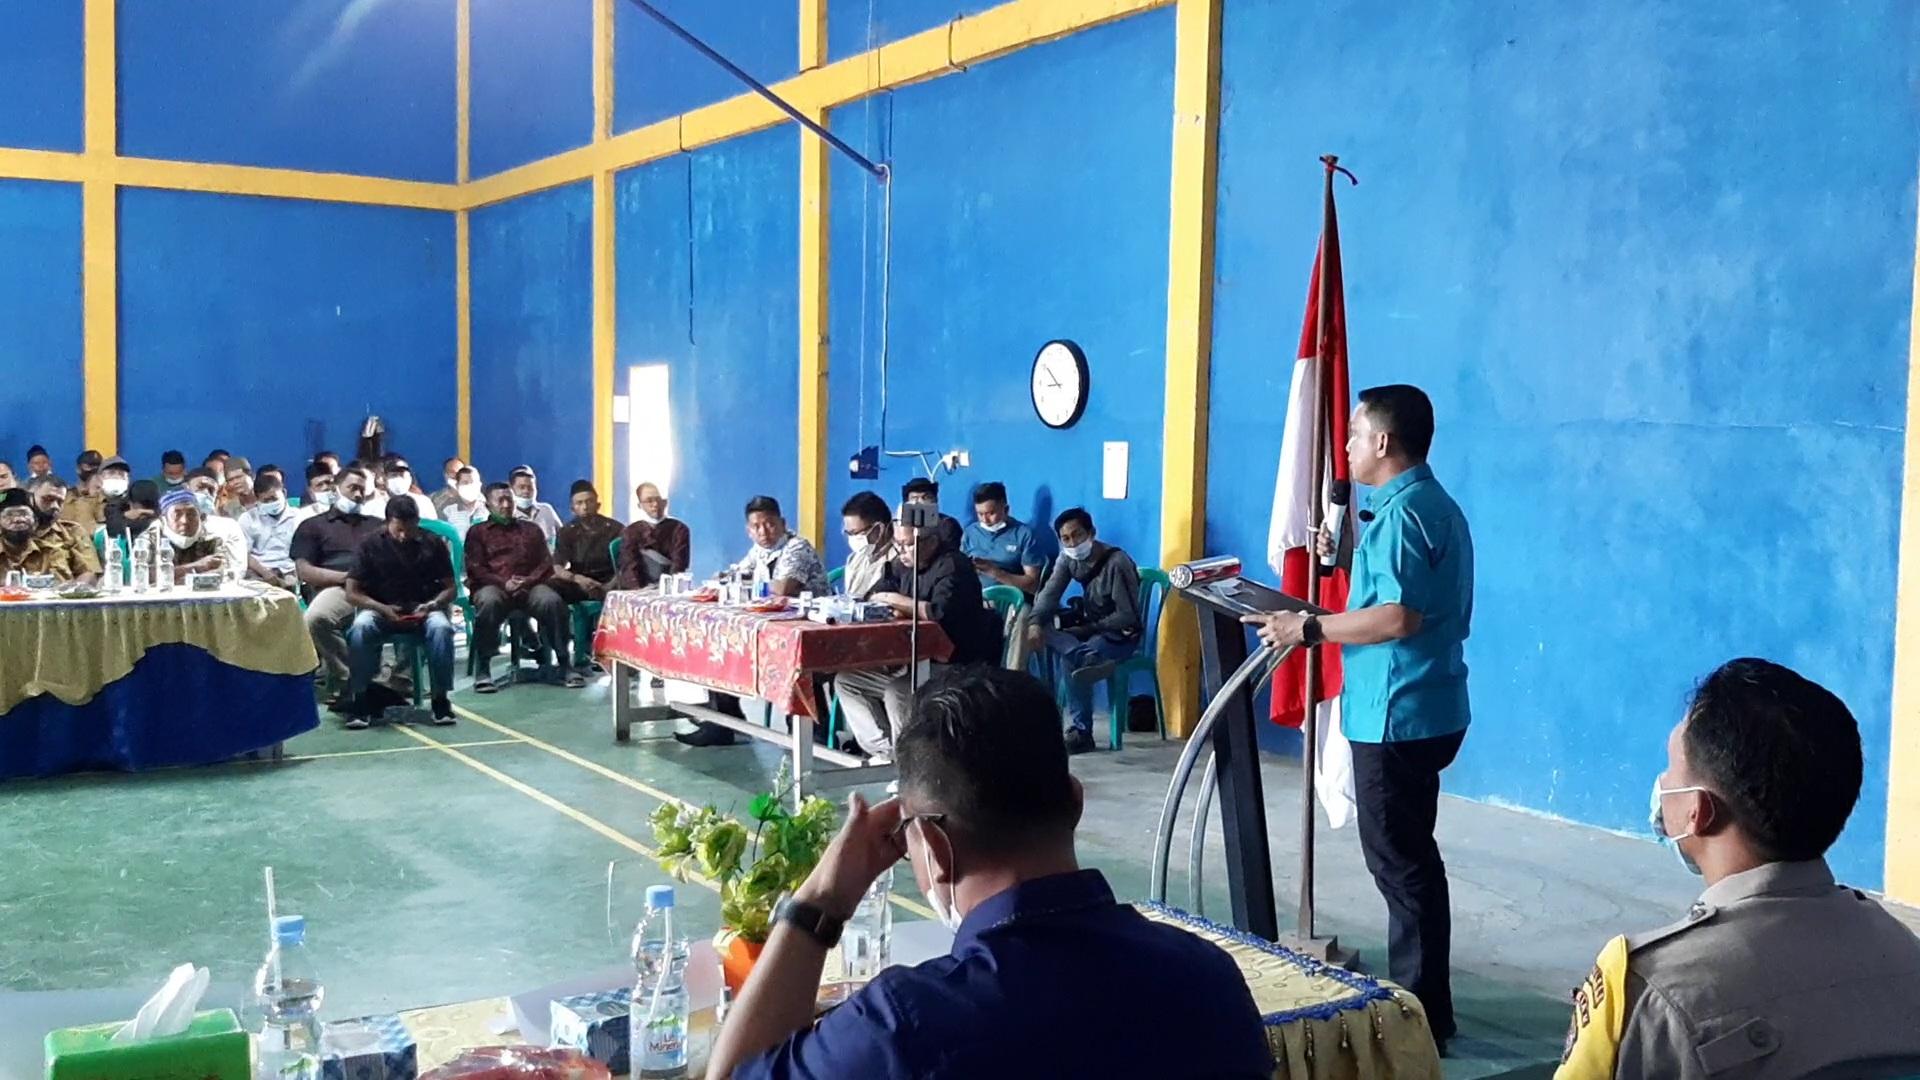 Kades Batu Ampar: Hanya 1 Anggota DPRD Riau yang Datang ke Desa Kami